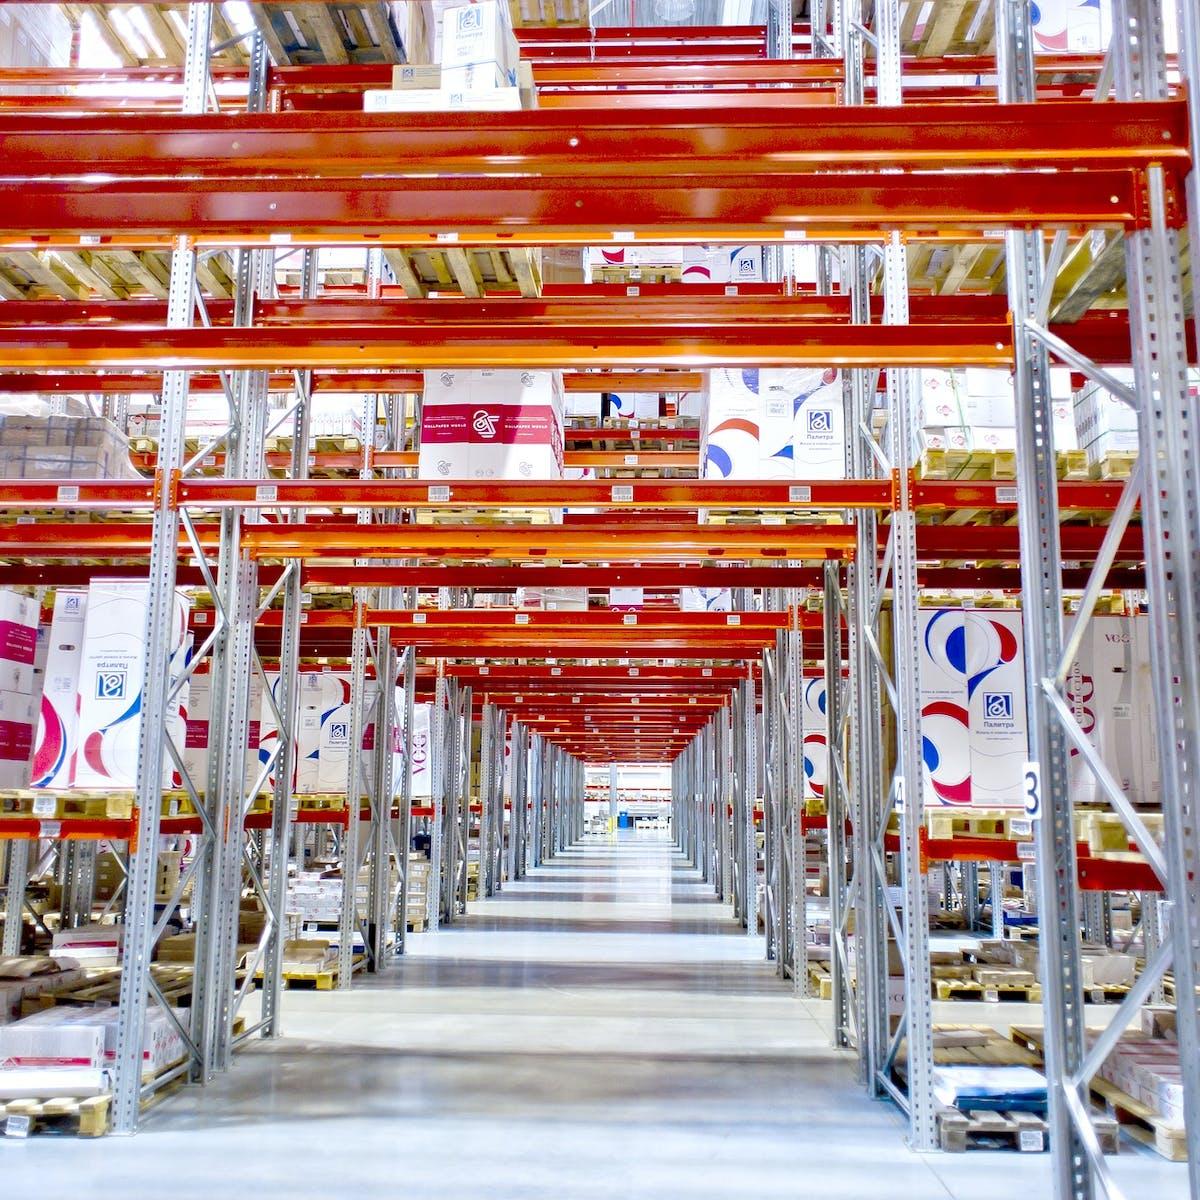 Titelbild-Einführung-Logistikzentrum-Lager-Logistik-Produktion-pixabay-2184358-stafichukanatoly